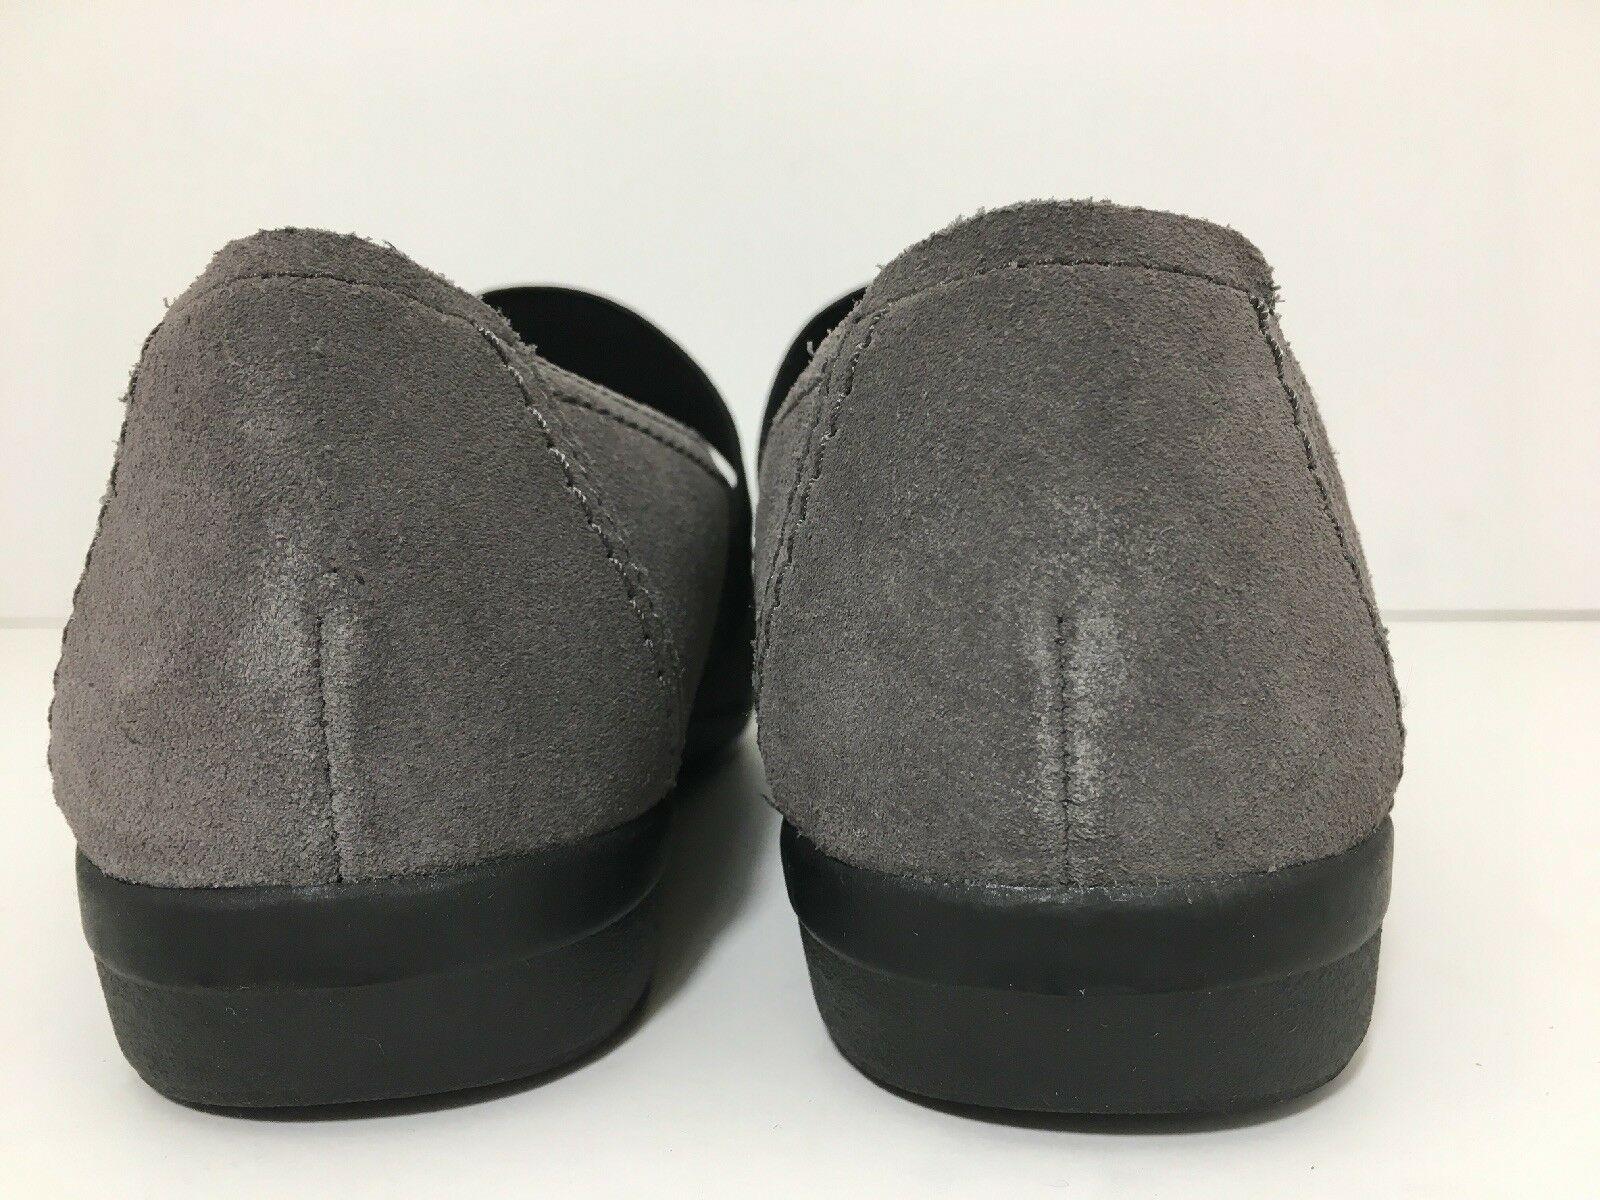 Clarks Haydin Women's Flats Comfort Loafers Shoes Juniper Grey Suede US 7 D Wide